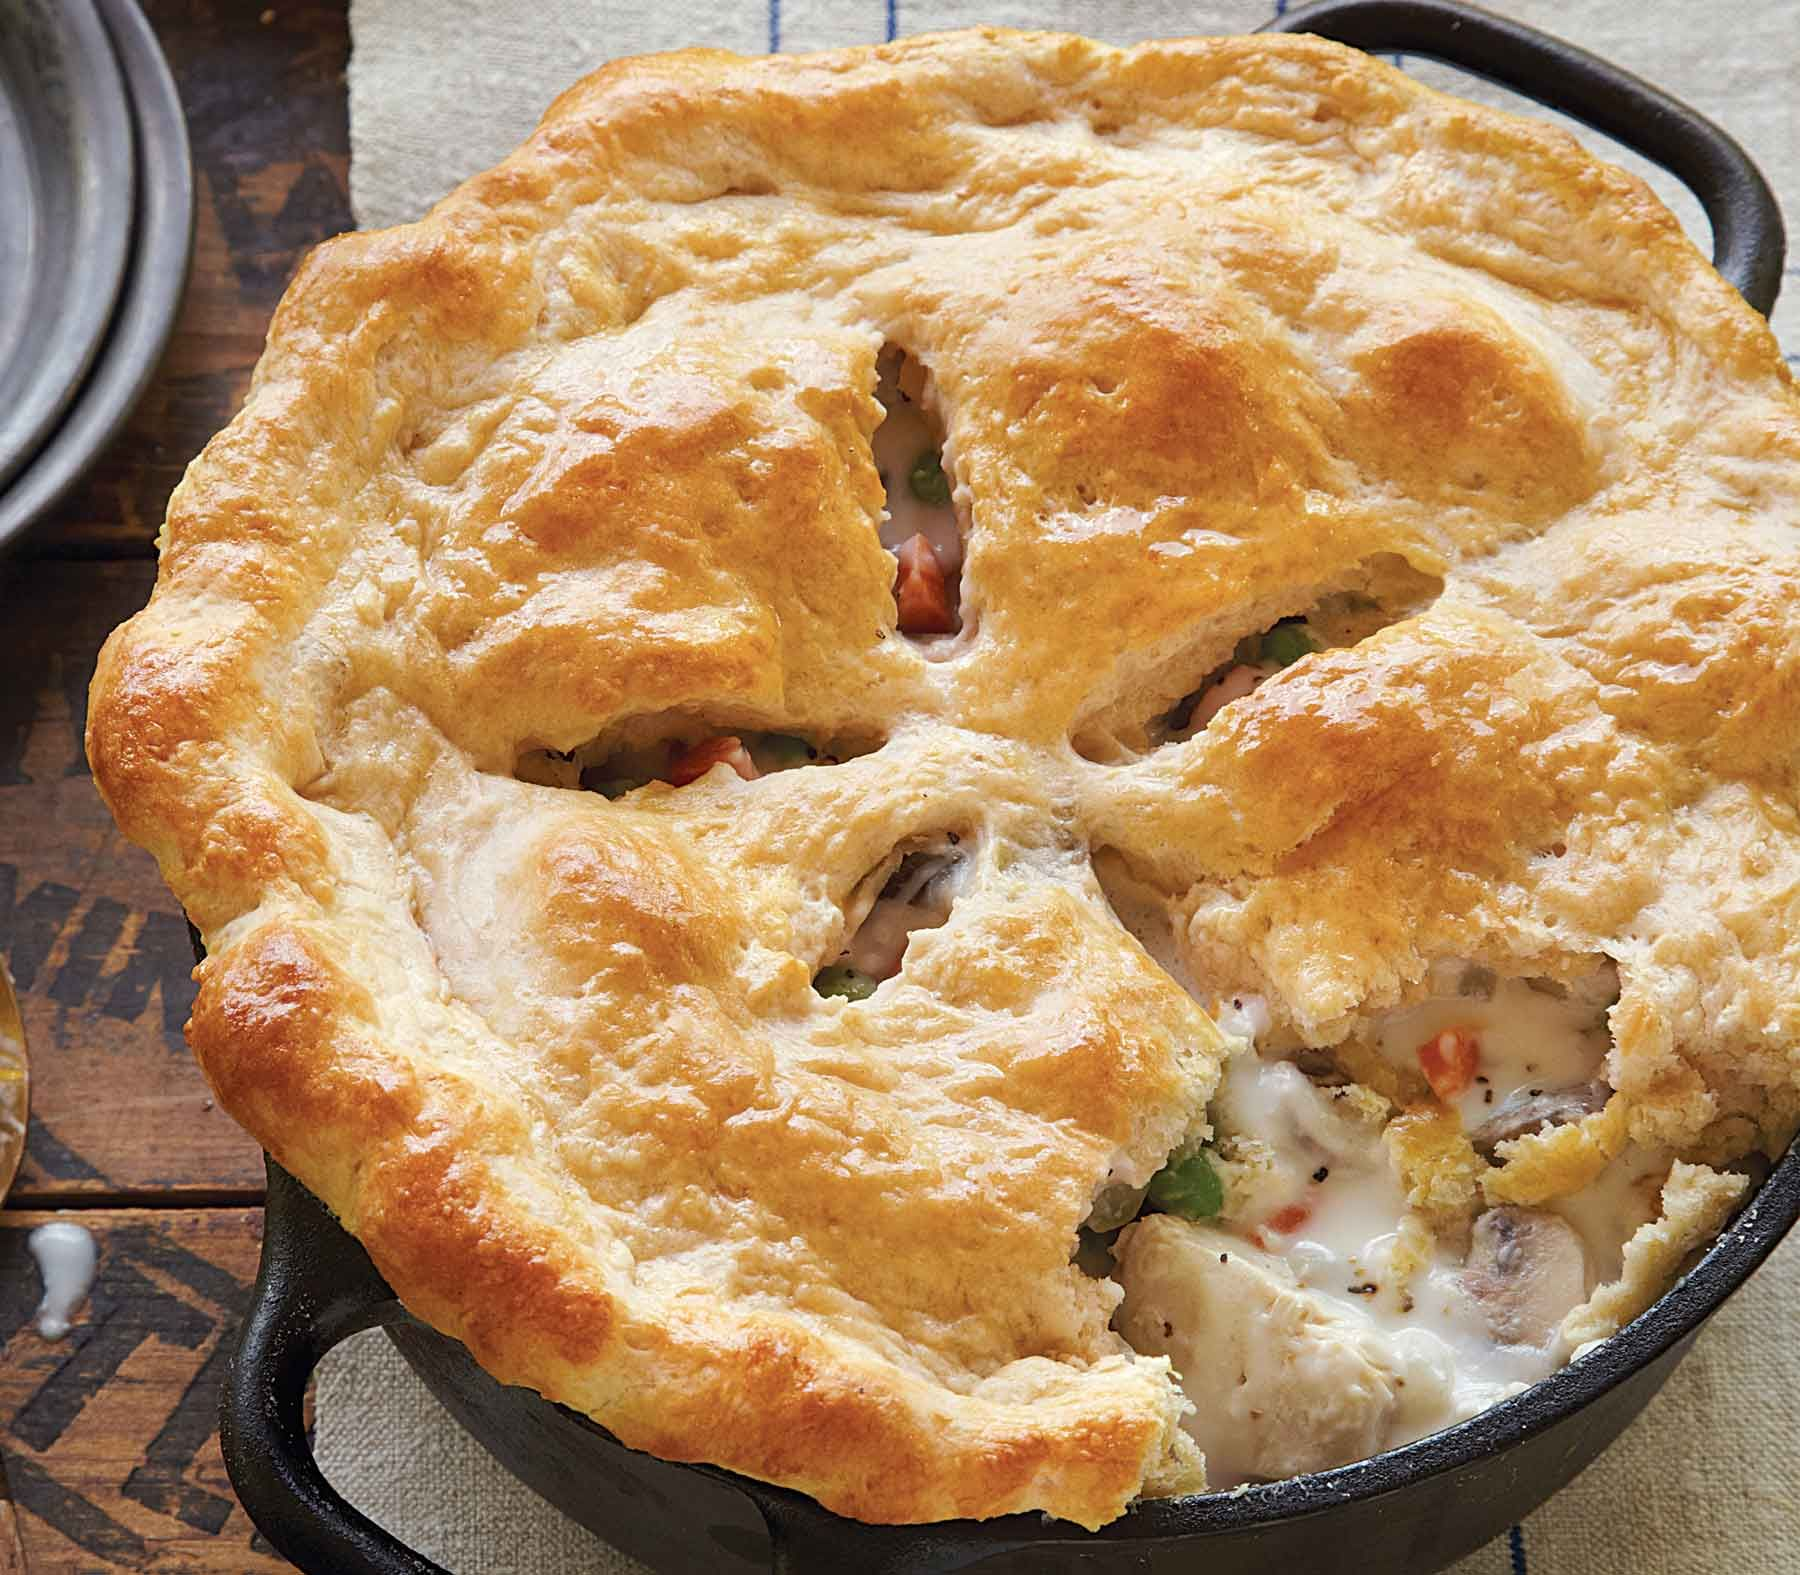 New England Chicken Pot Pie With Biscuit Crust Recipe in